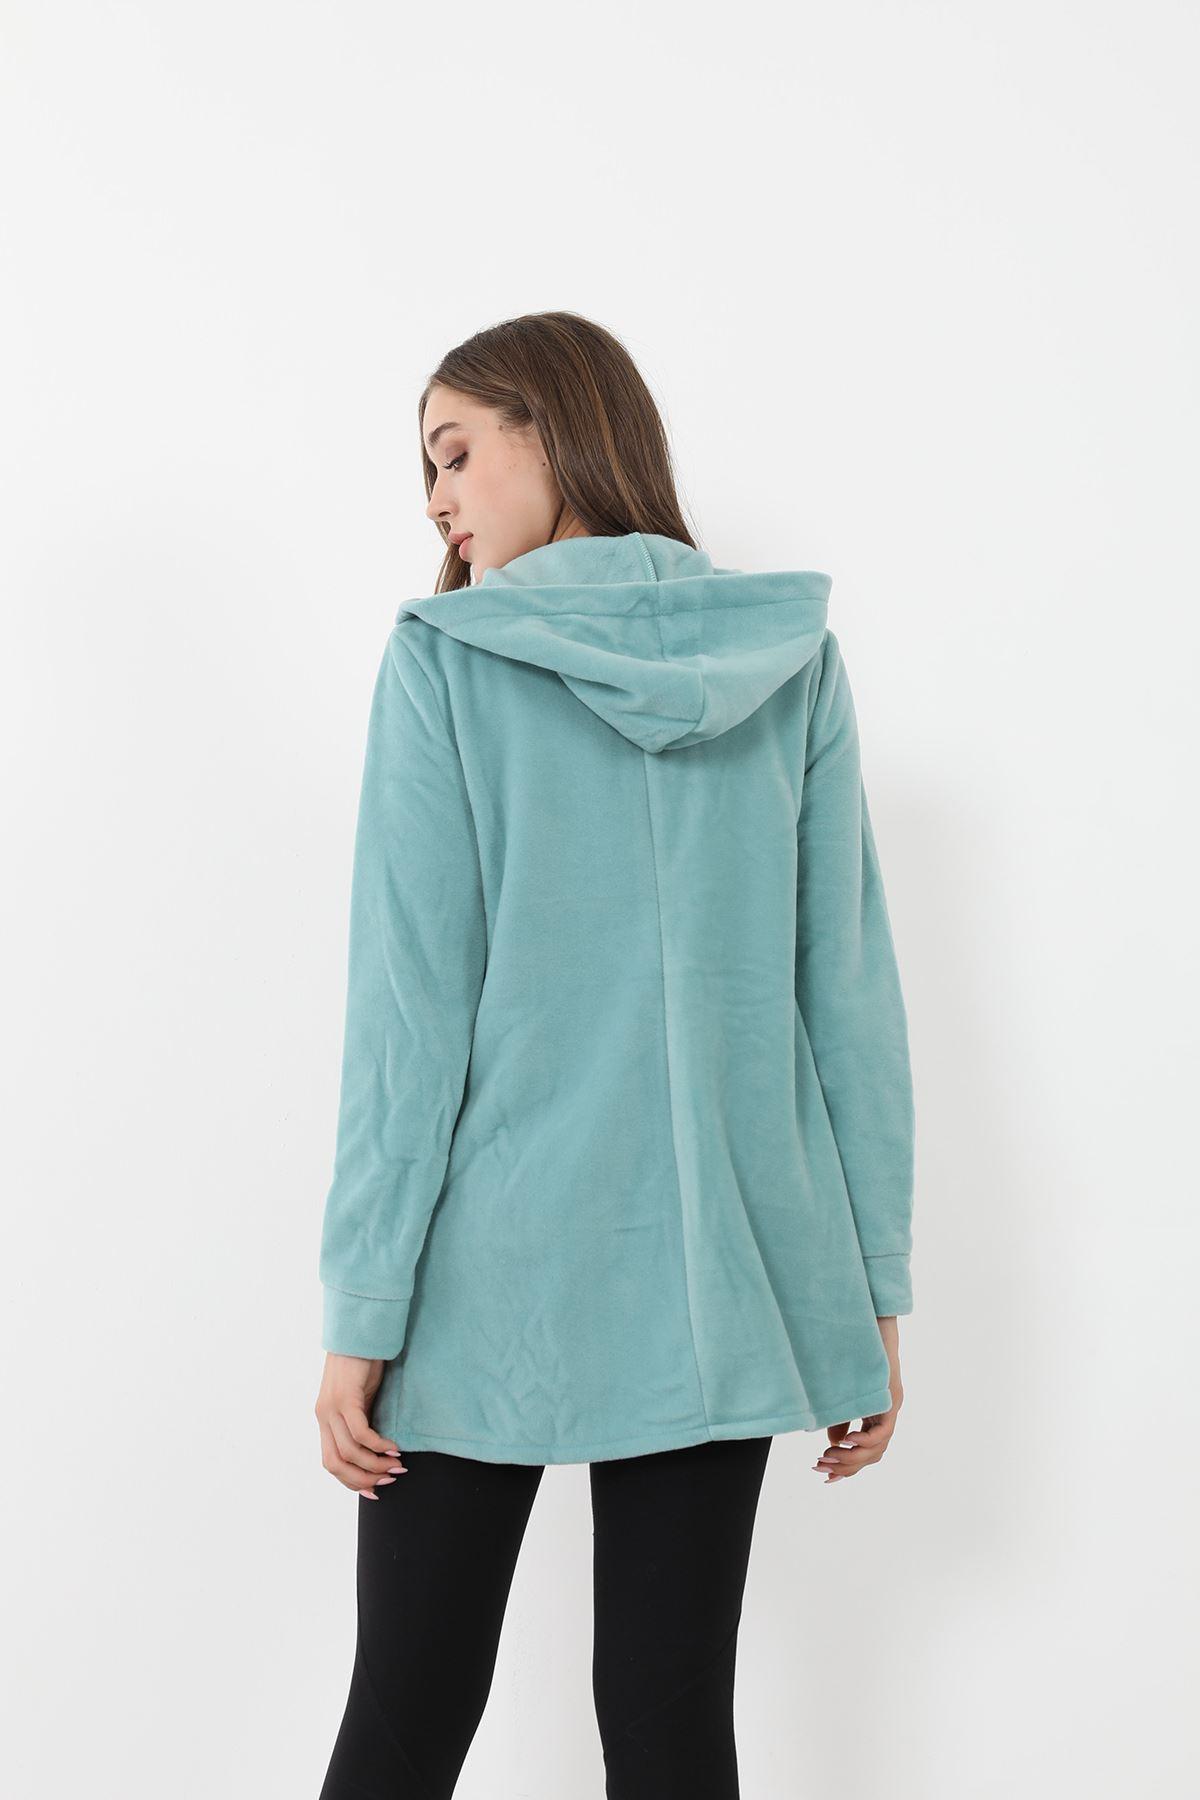 Fermuarlı Polar Sweatshirt-Mint